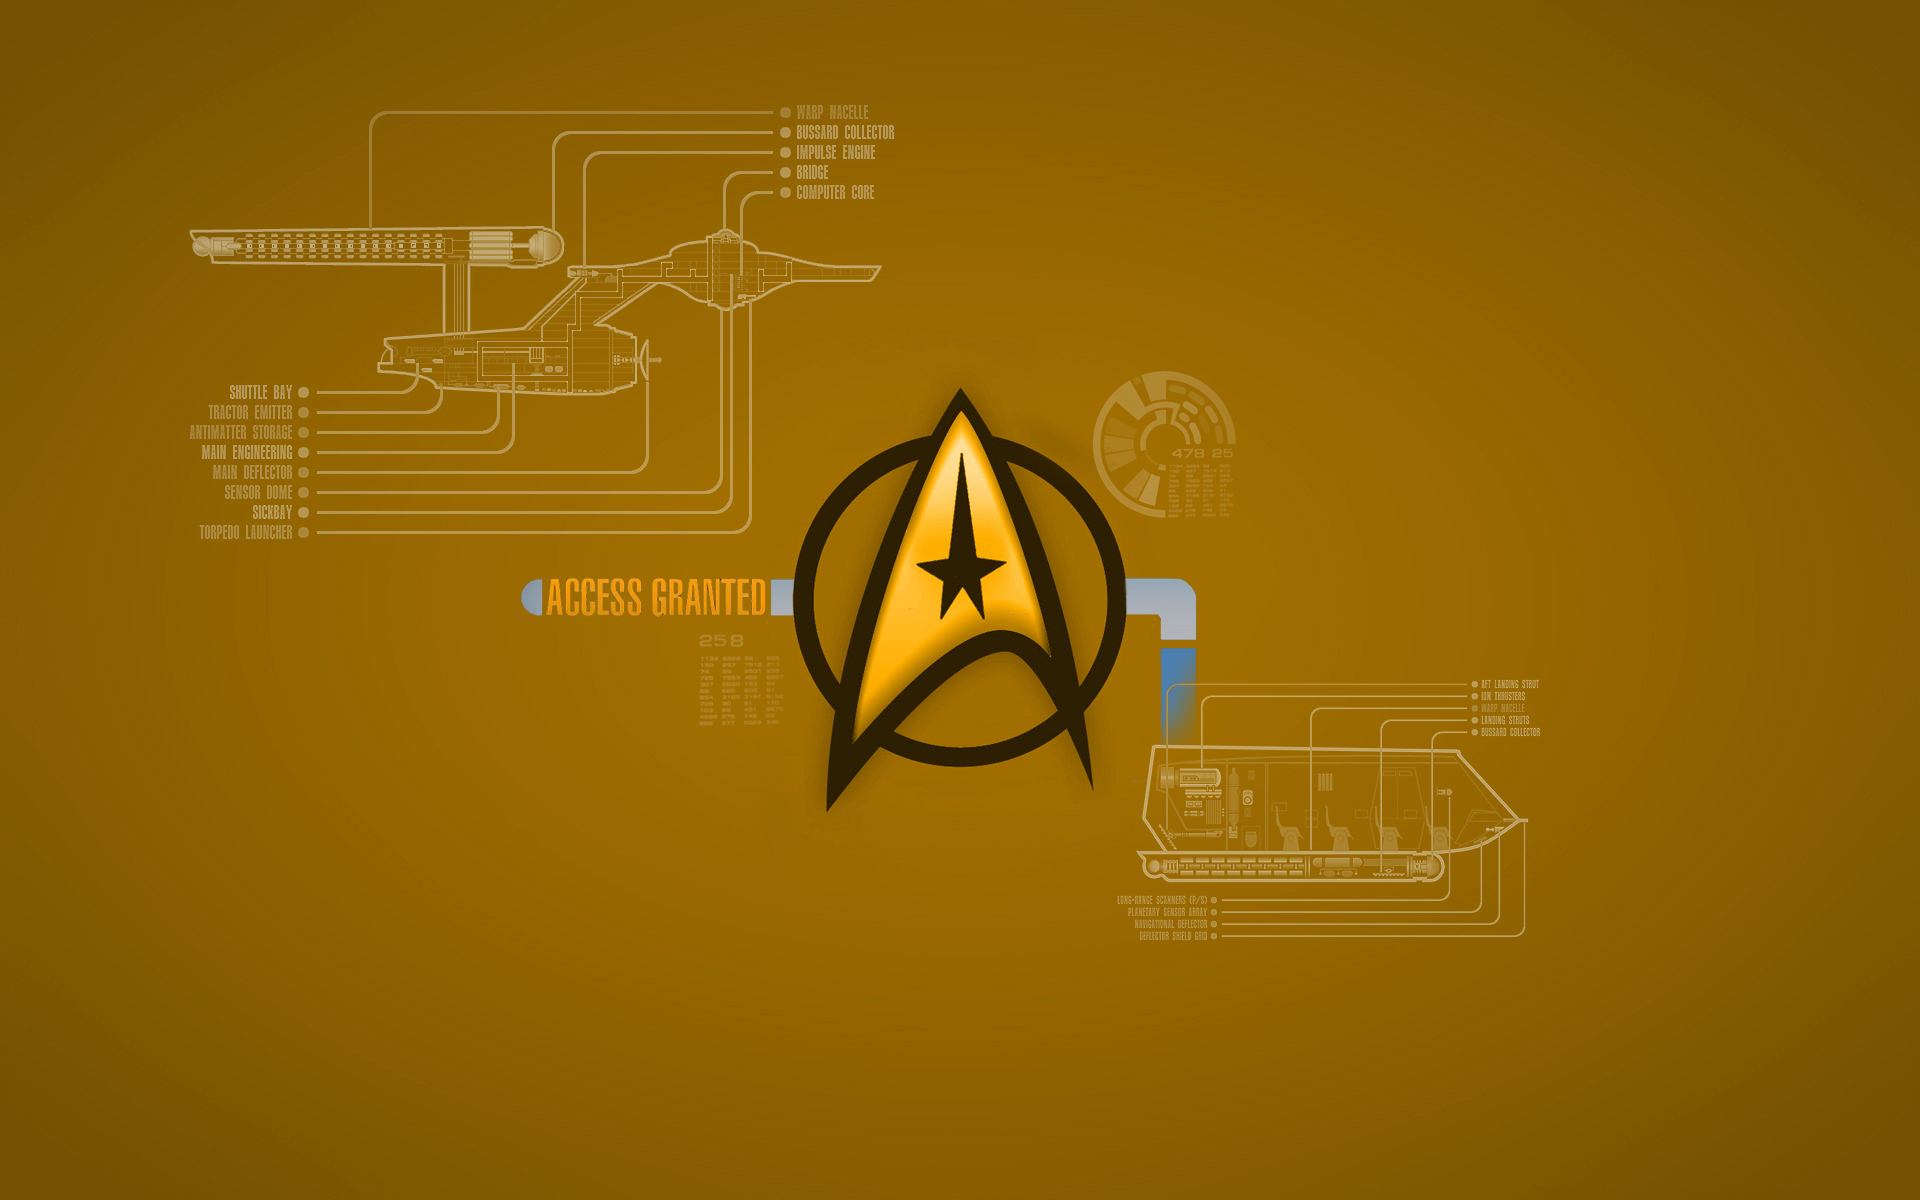 Star trek full hd wallpaper and background image - Star trek symbol wallpaper ...